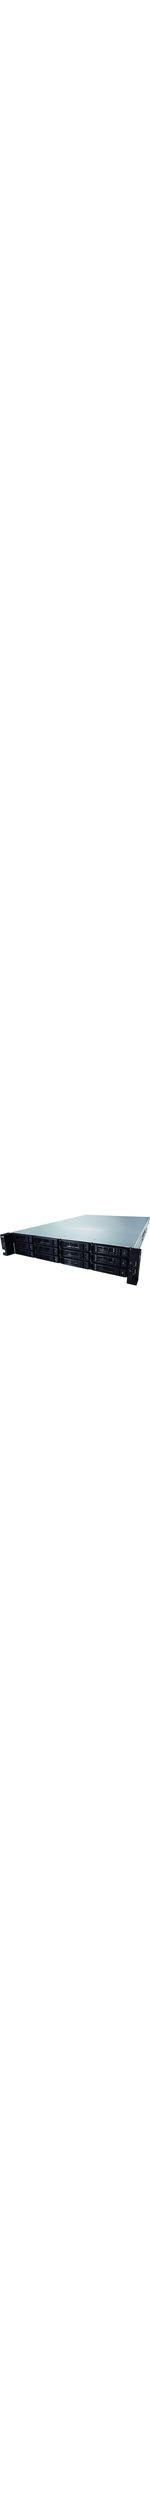 Buffalo TeraStation TS-2RZH72T12D 12 x Total Bays NAS Server - 2U - Rack-mountable